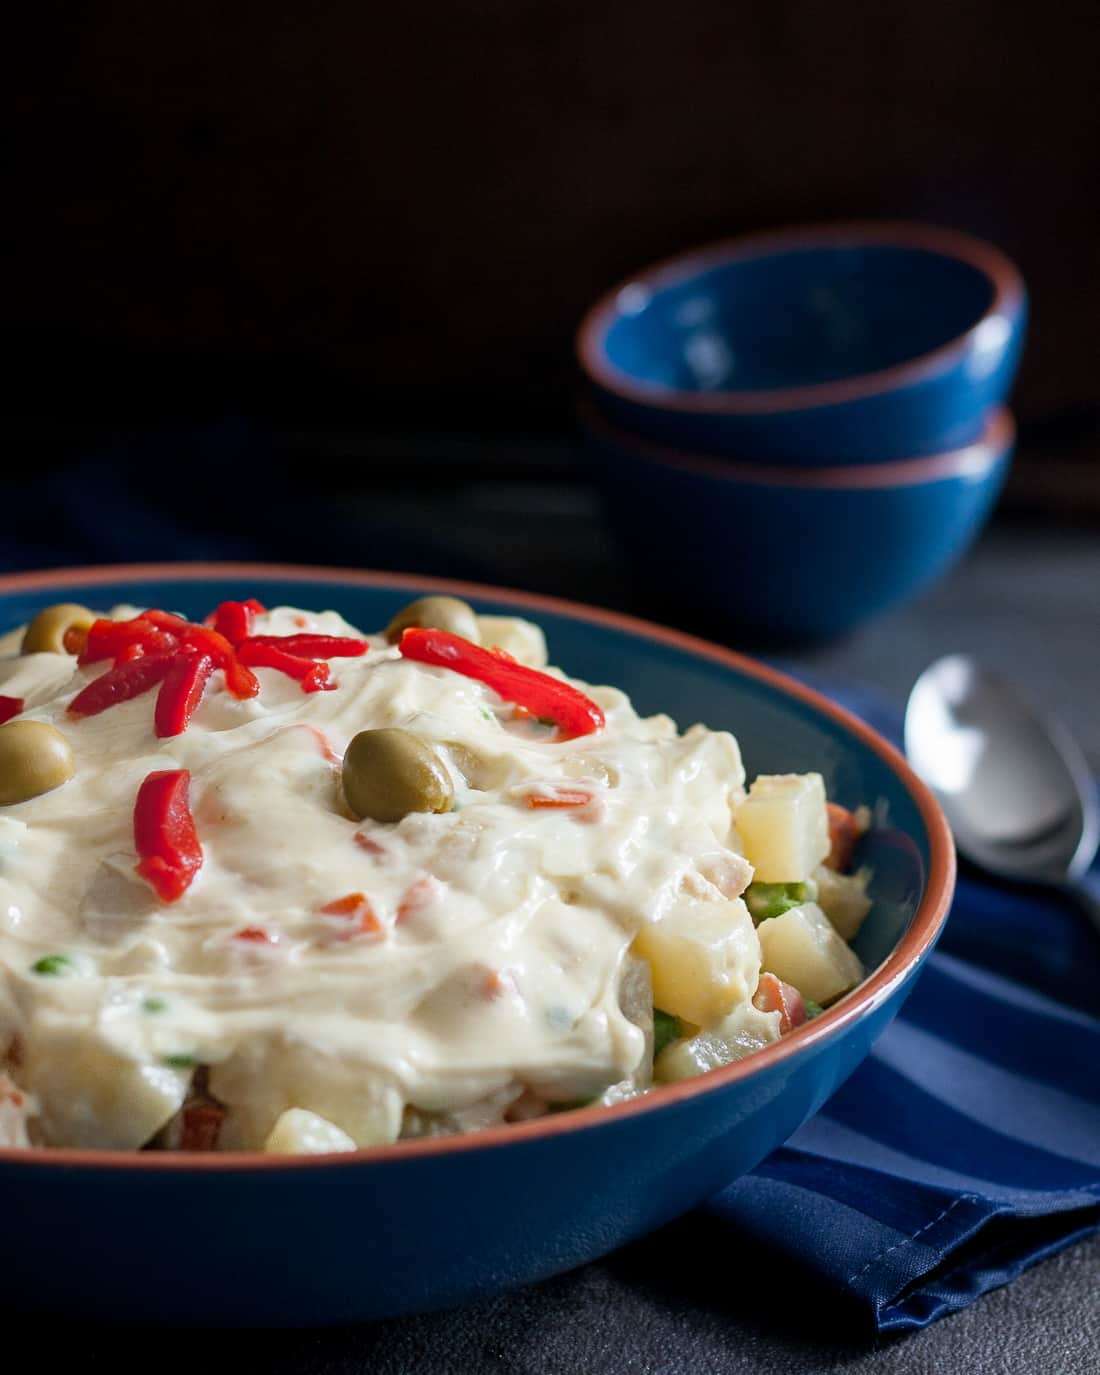 Ensaladilla Rusa, also called Ensalada Rusa, or just Spanish potato salad, is a favorite Spanish dish. * Recipe on GoodieGodmother.com